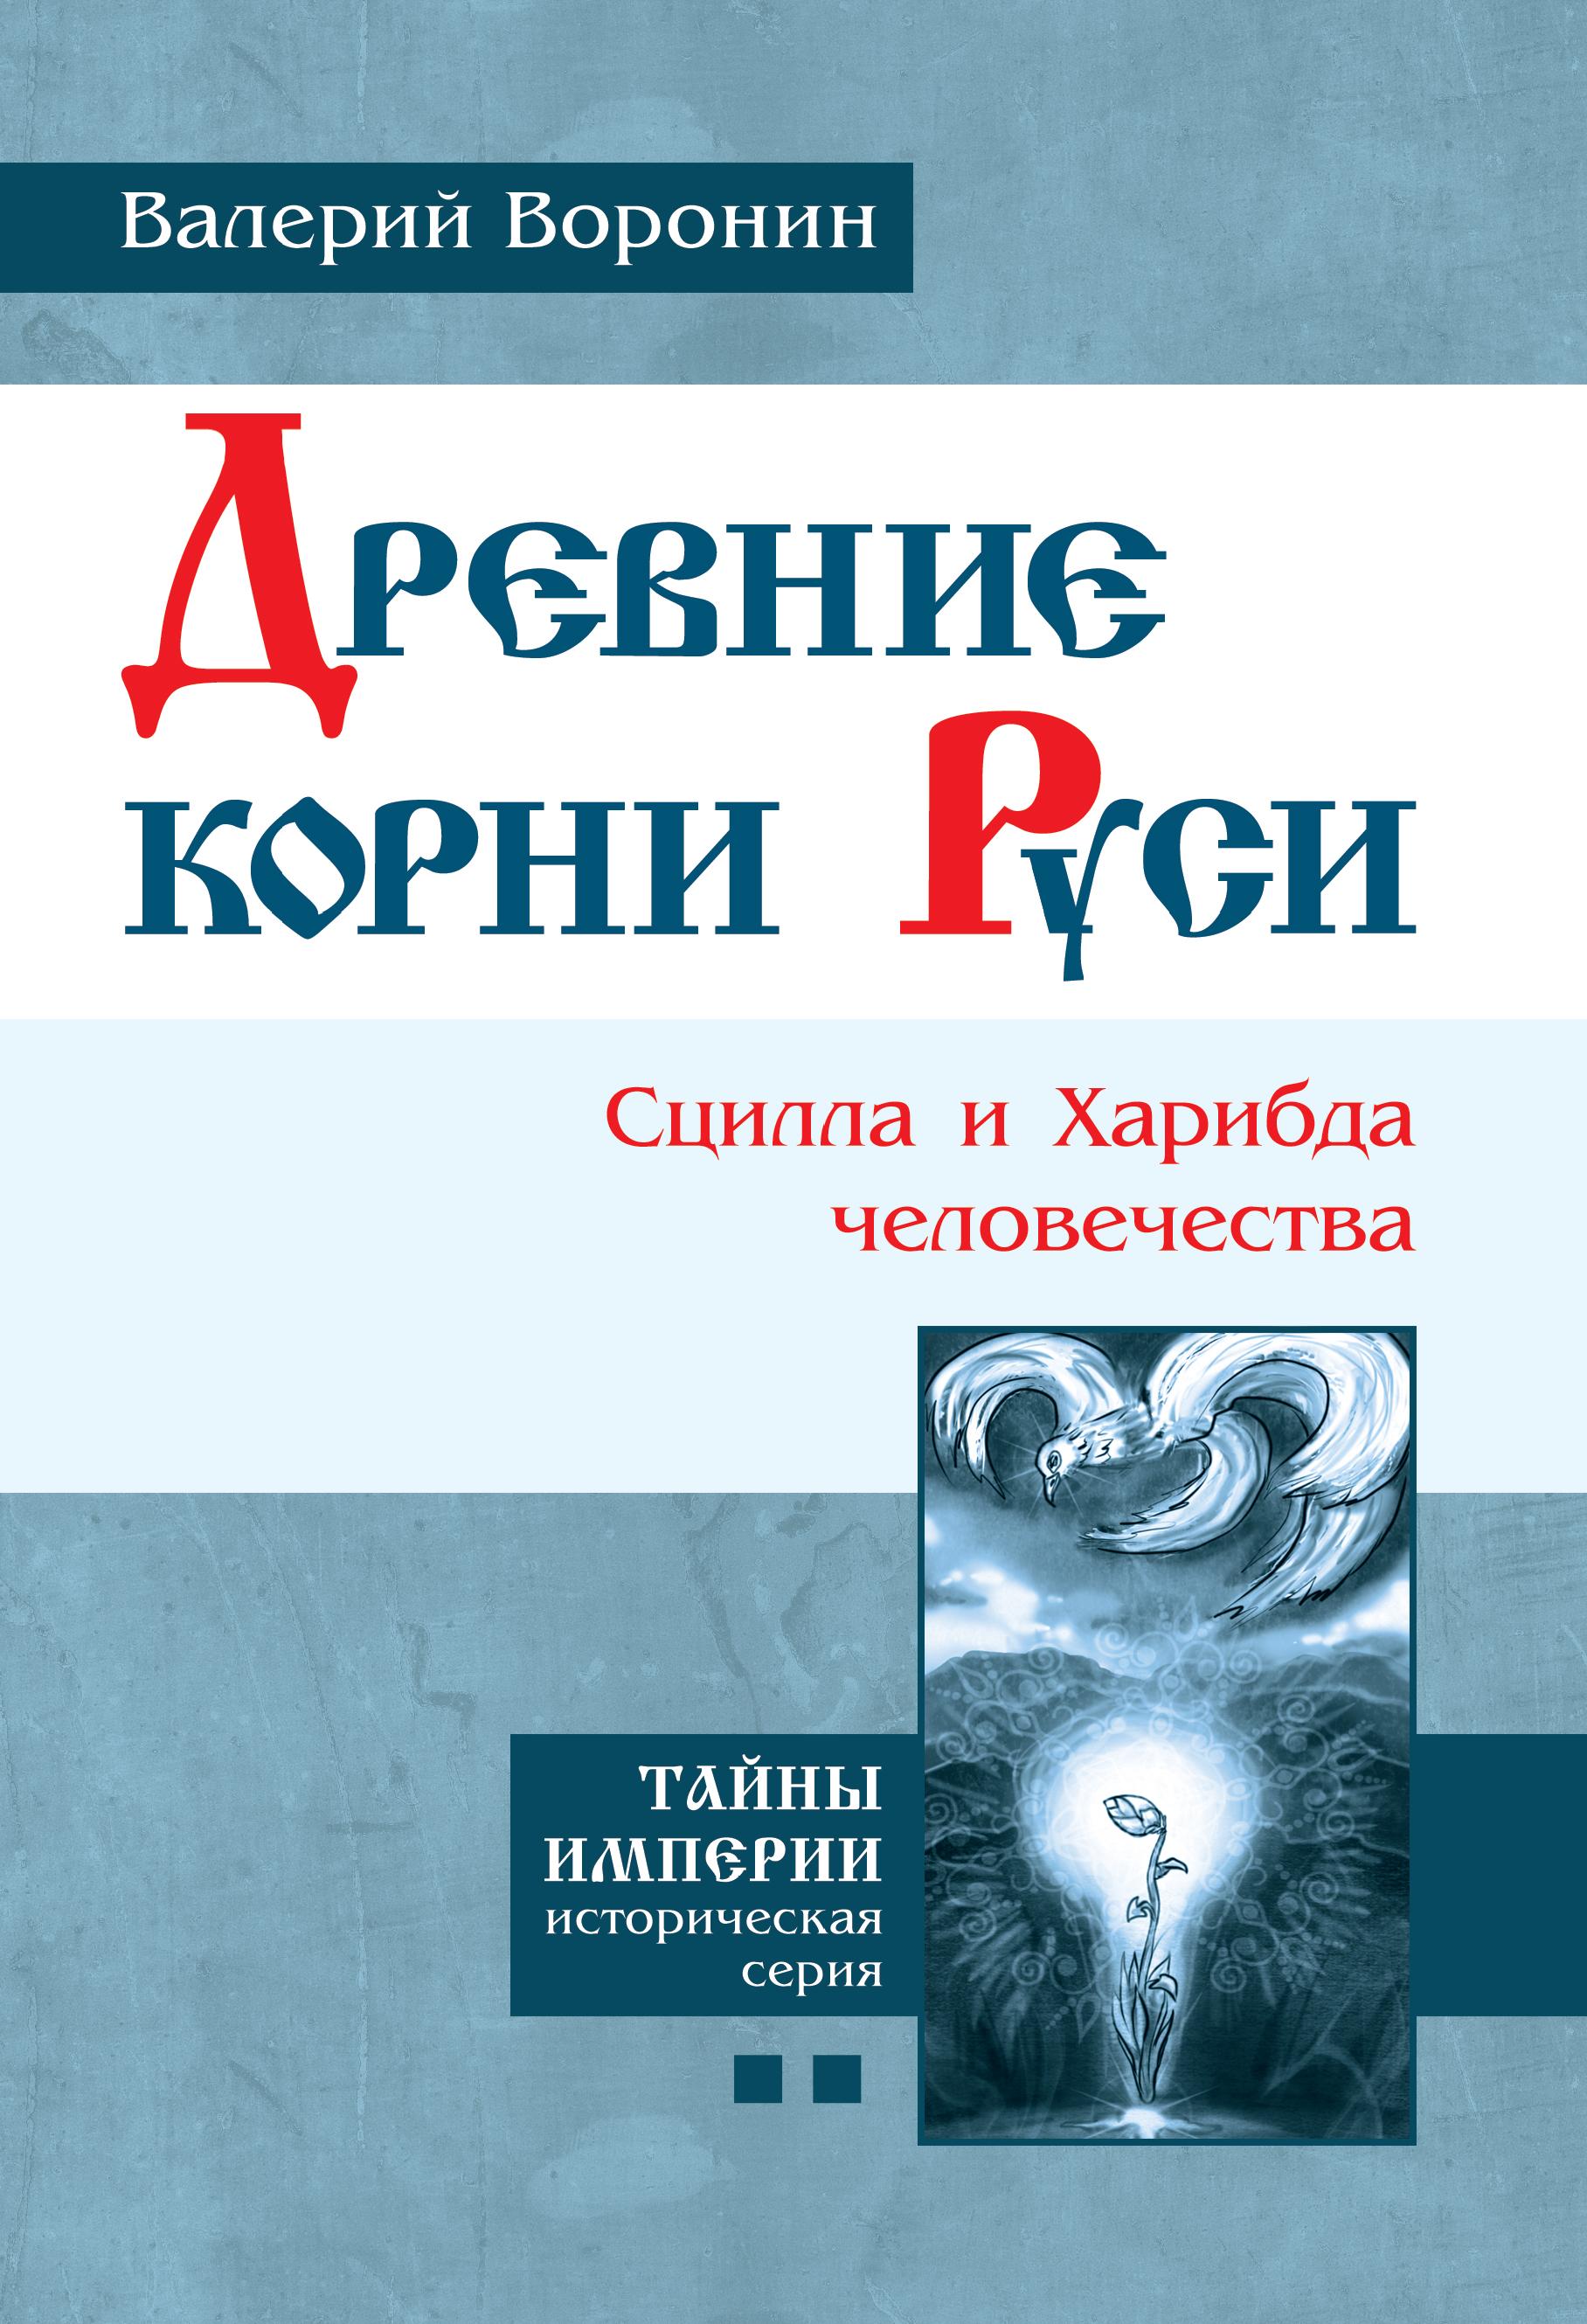 Древние корни Руси. Сцилла и Харибда человечества (пер)